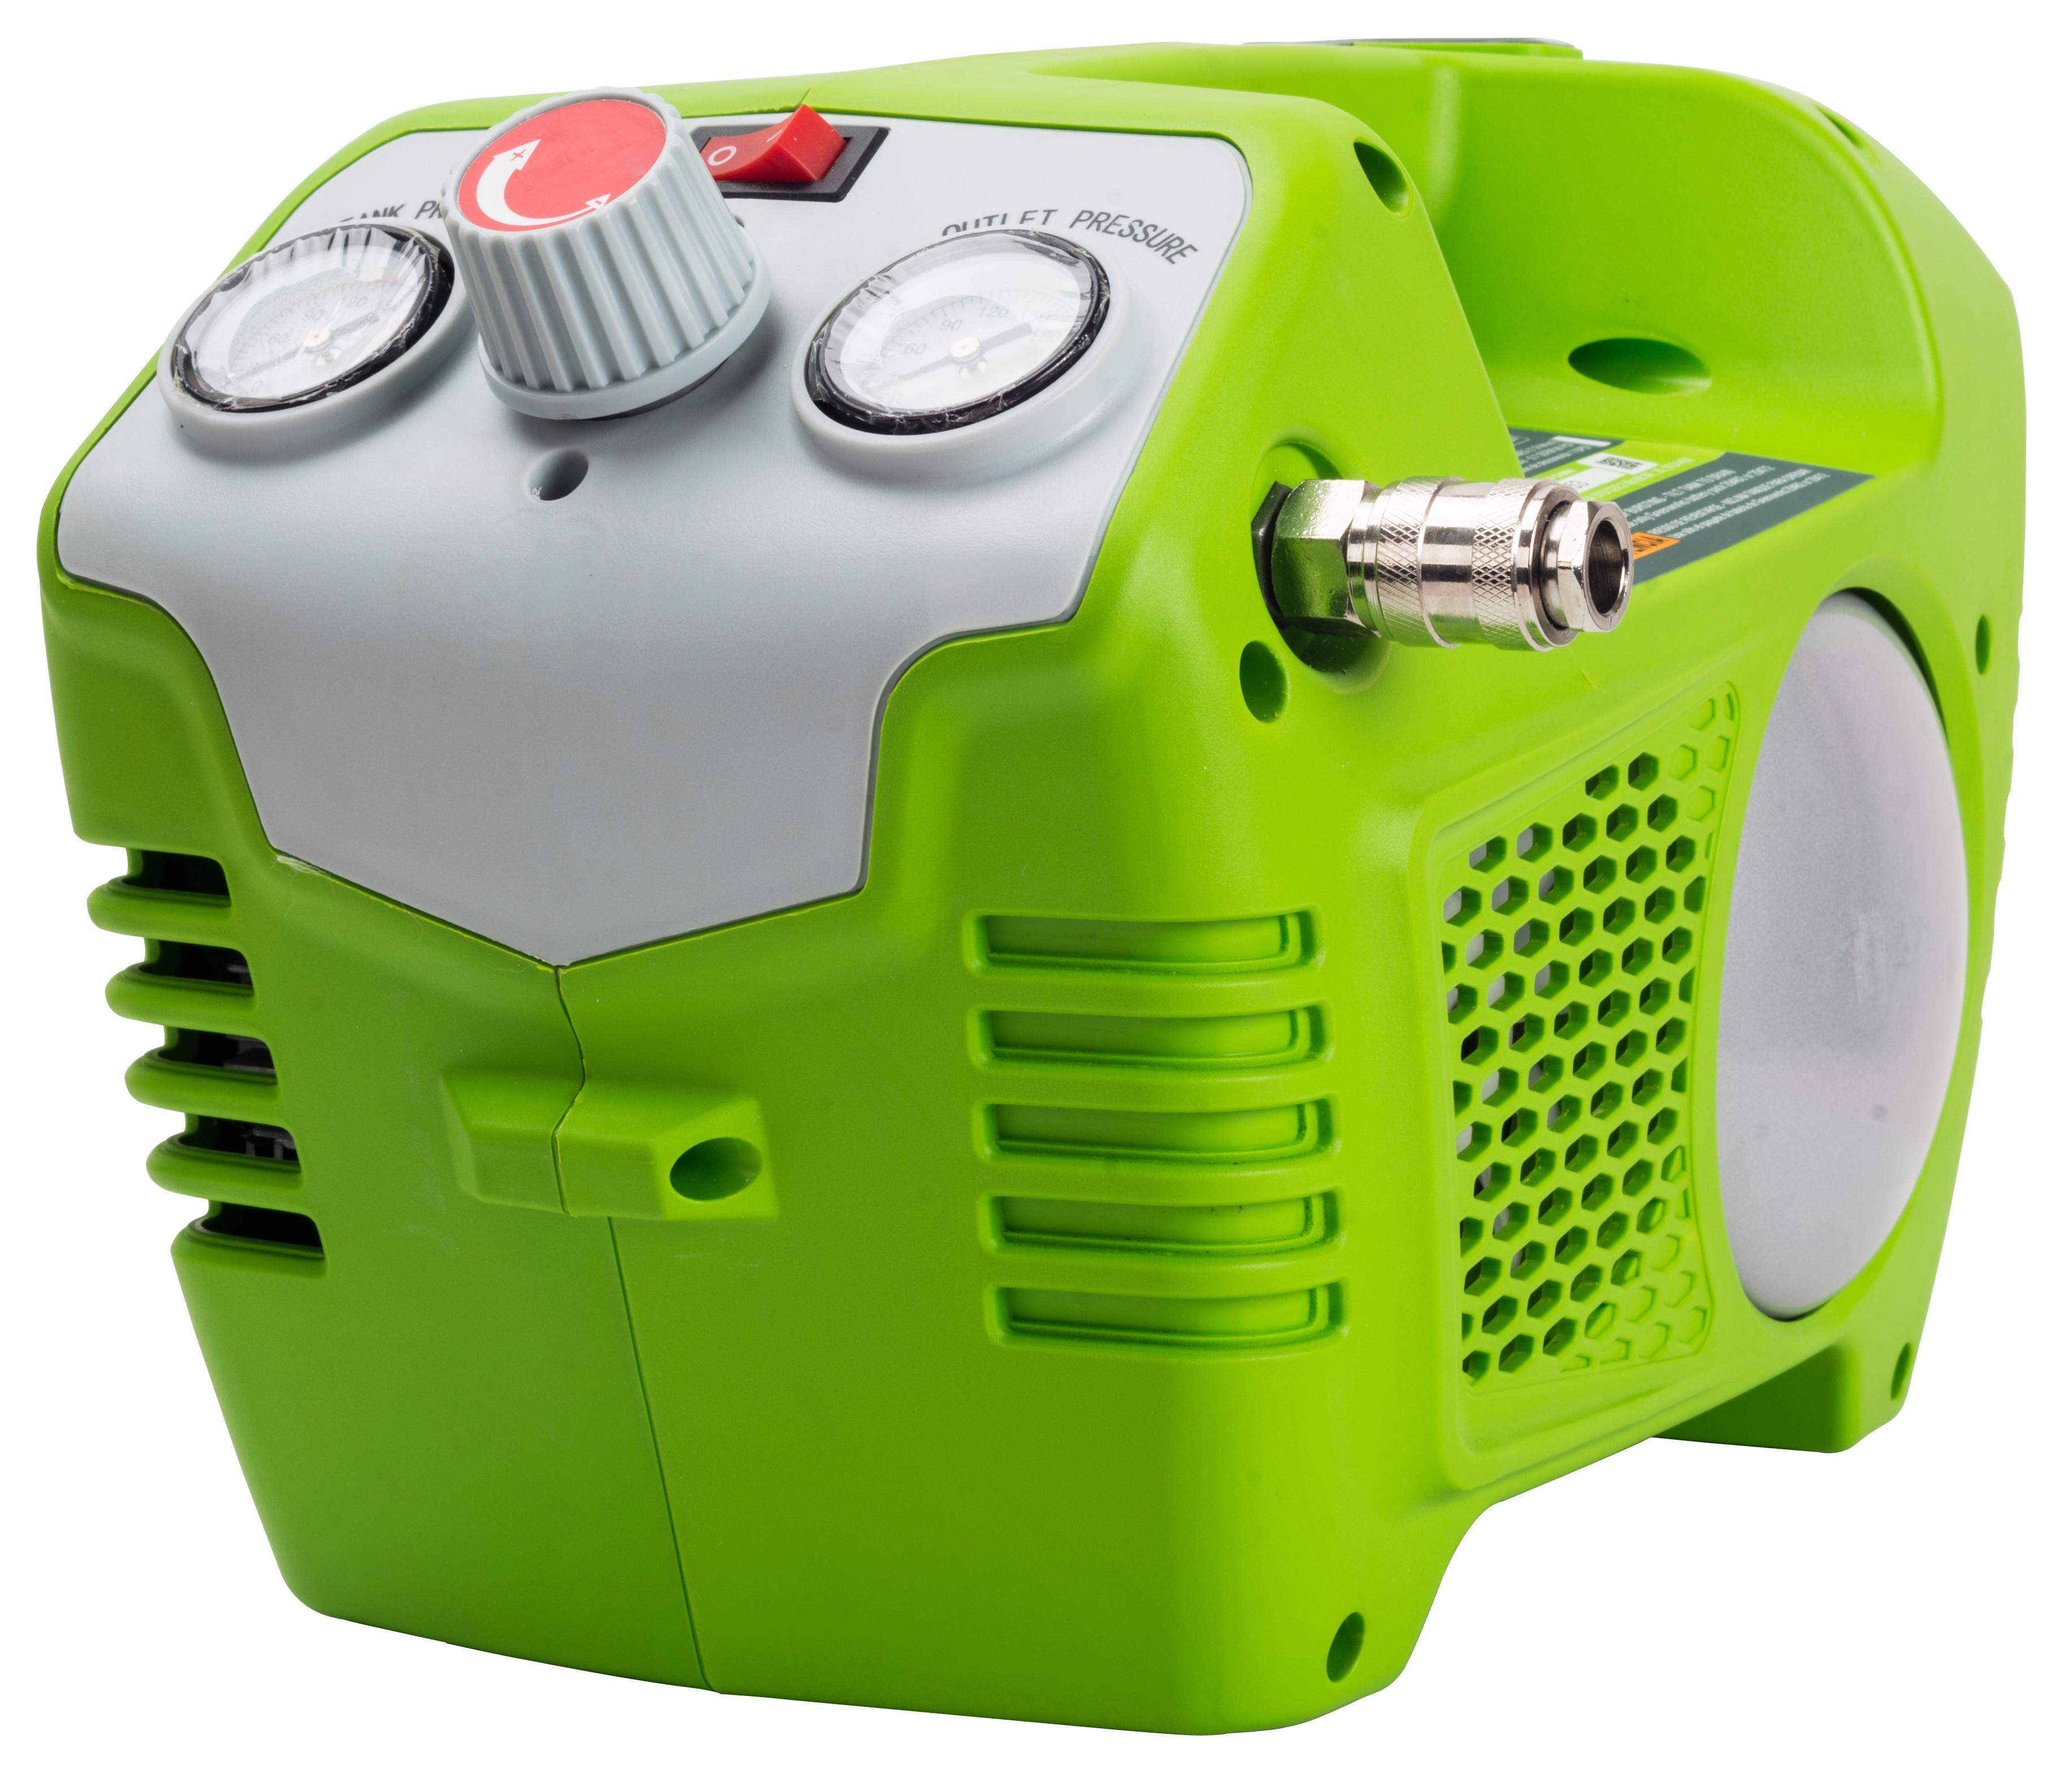 Компрессор Greenworks G40ac (4100802) БЕЗ АККУМ и ЗУ